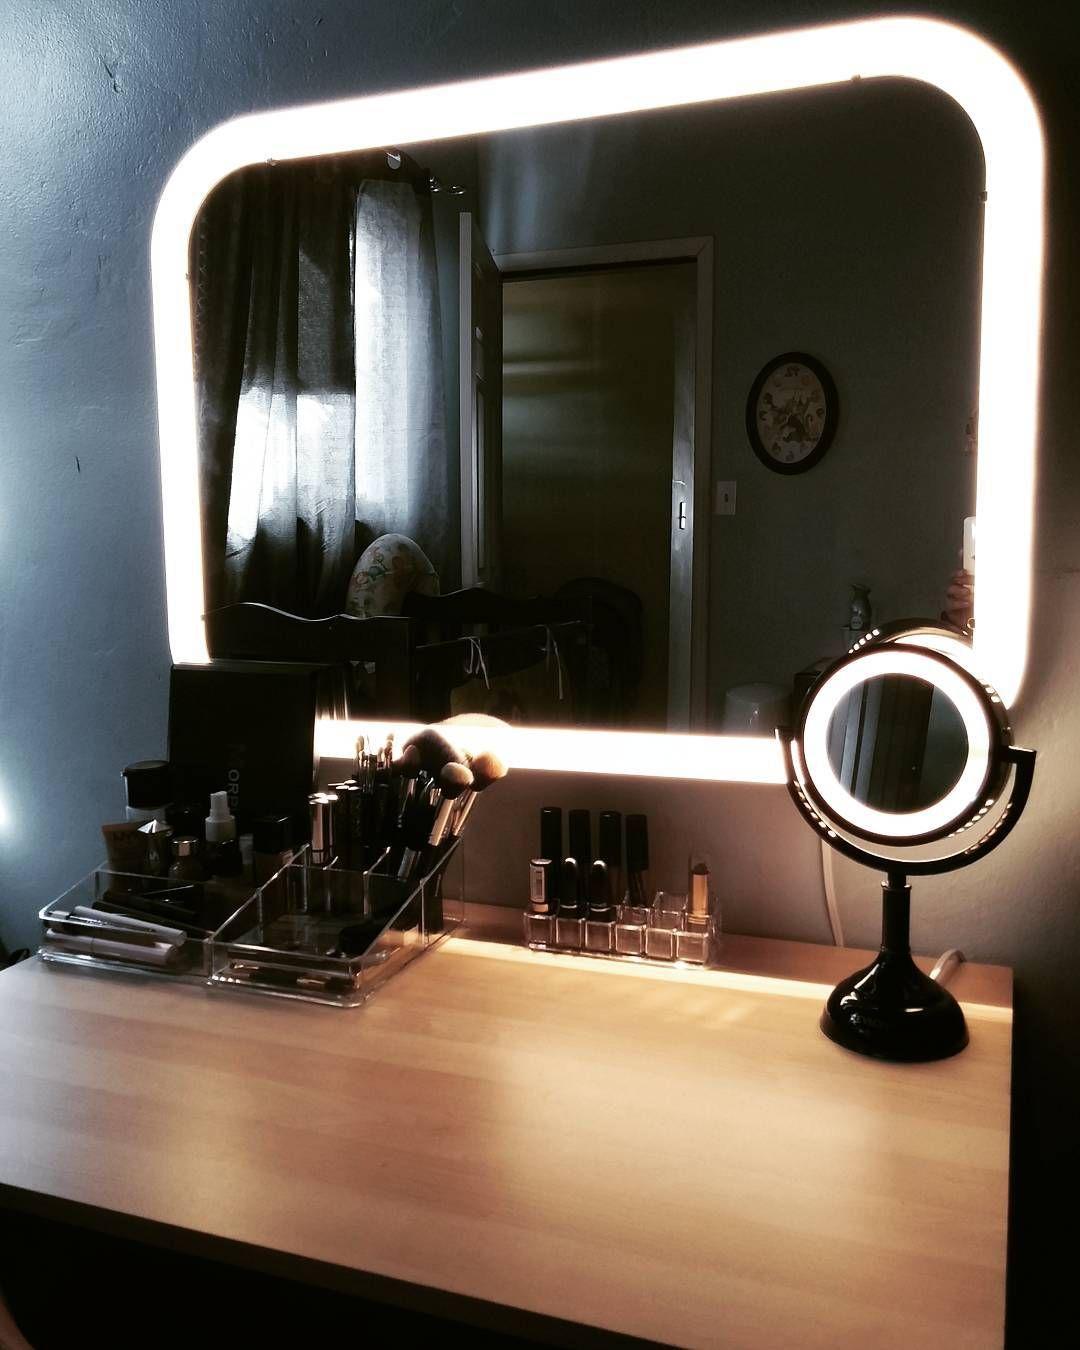 ikea storjorm - Makeup Eitelkeit Beleuchtung Ikea